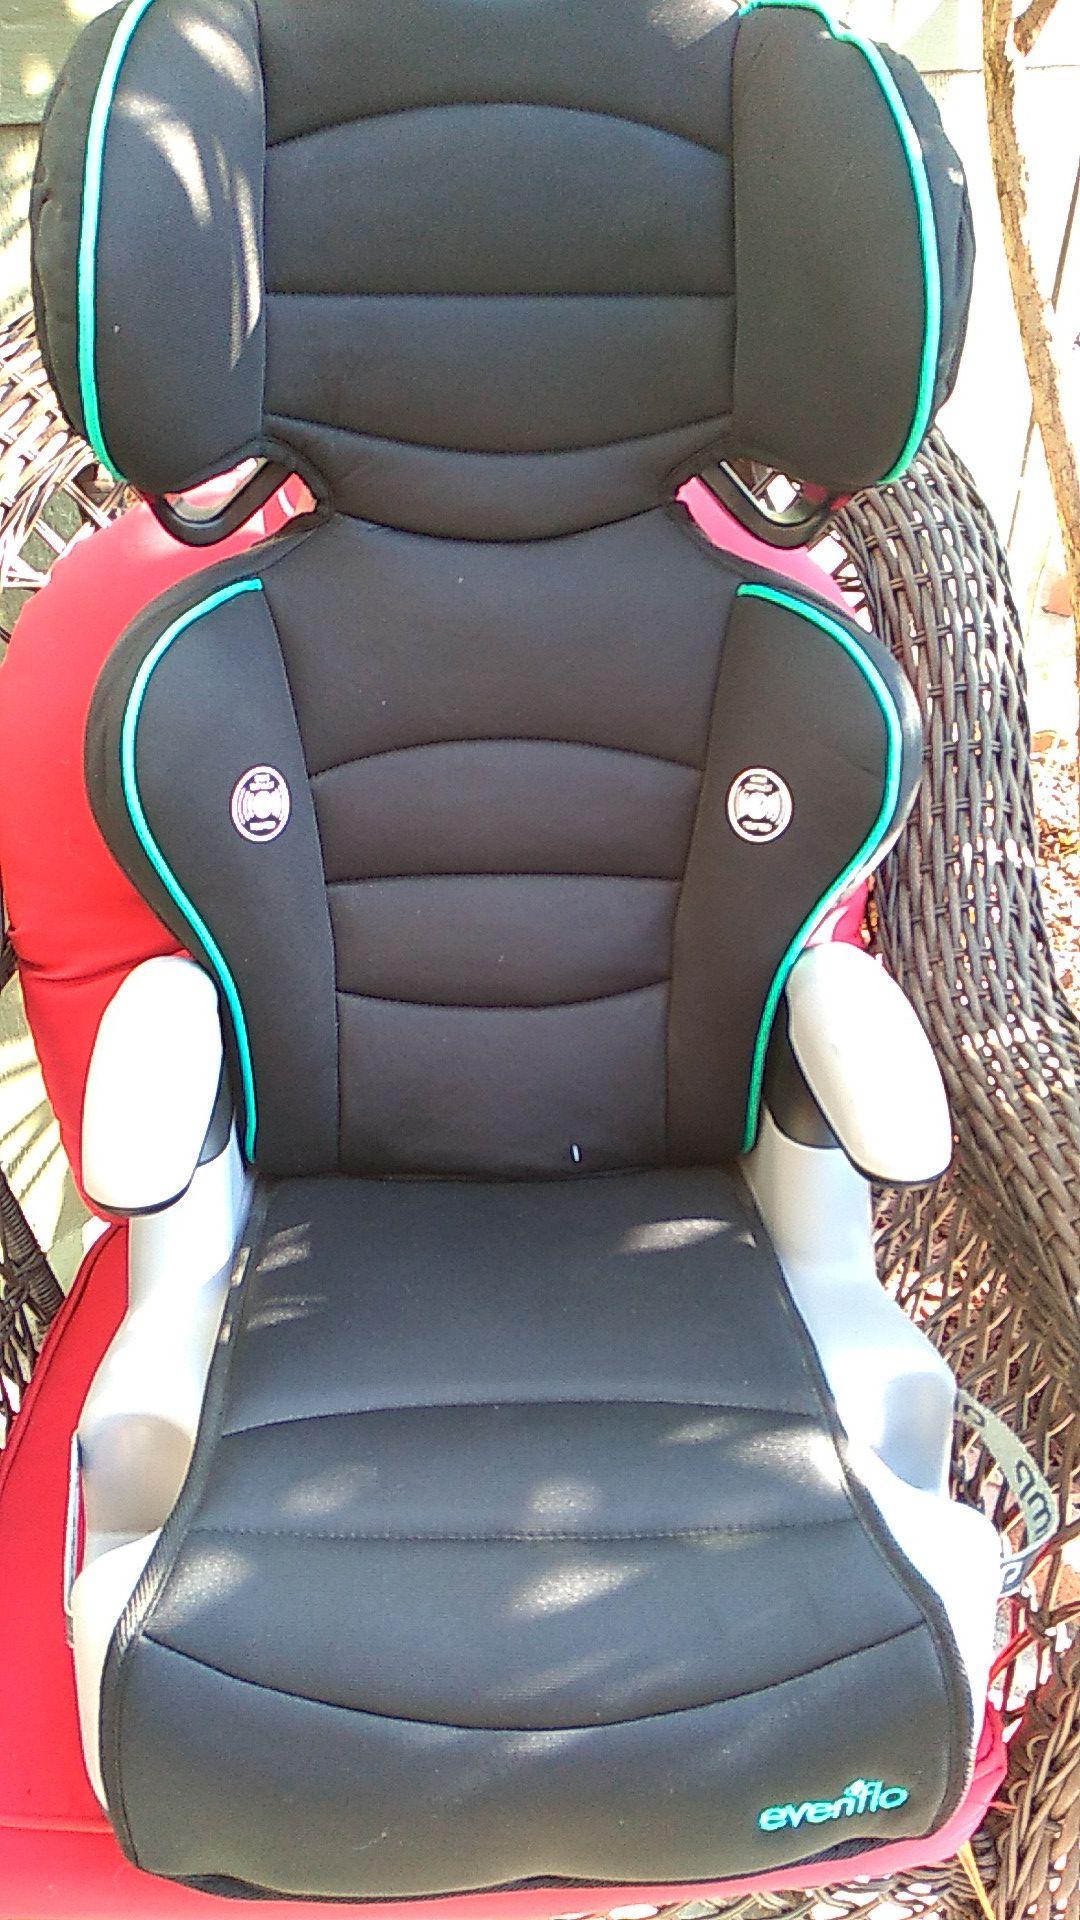 EVENFLO car seat exelent condition